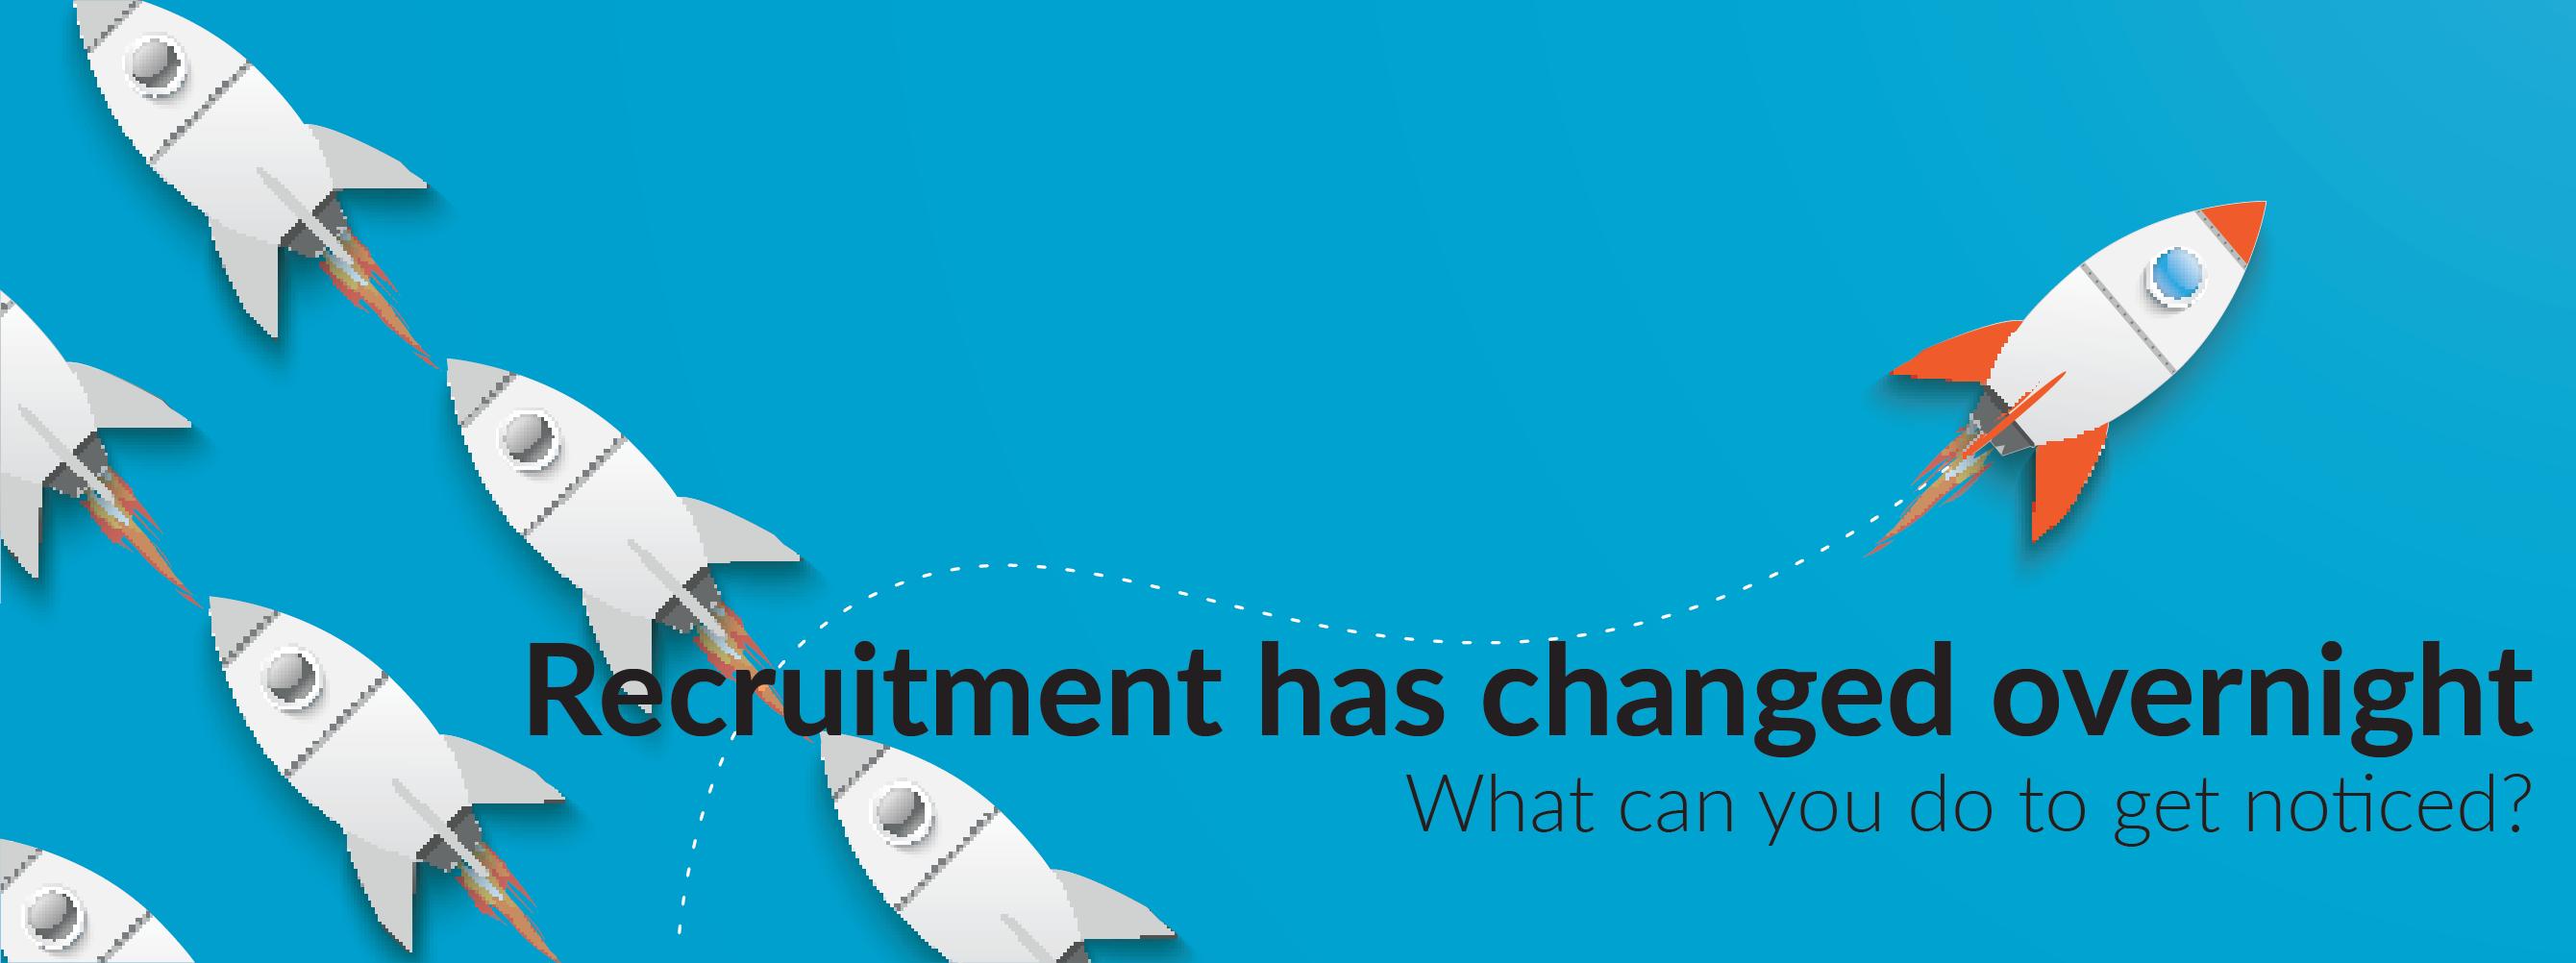 Recruitment has changed overnight